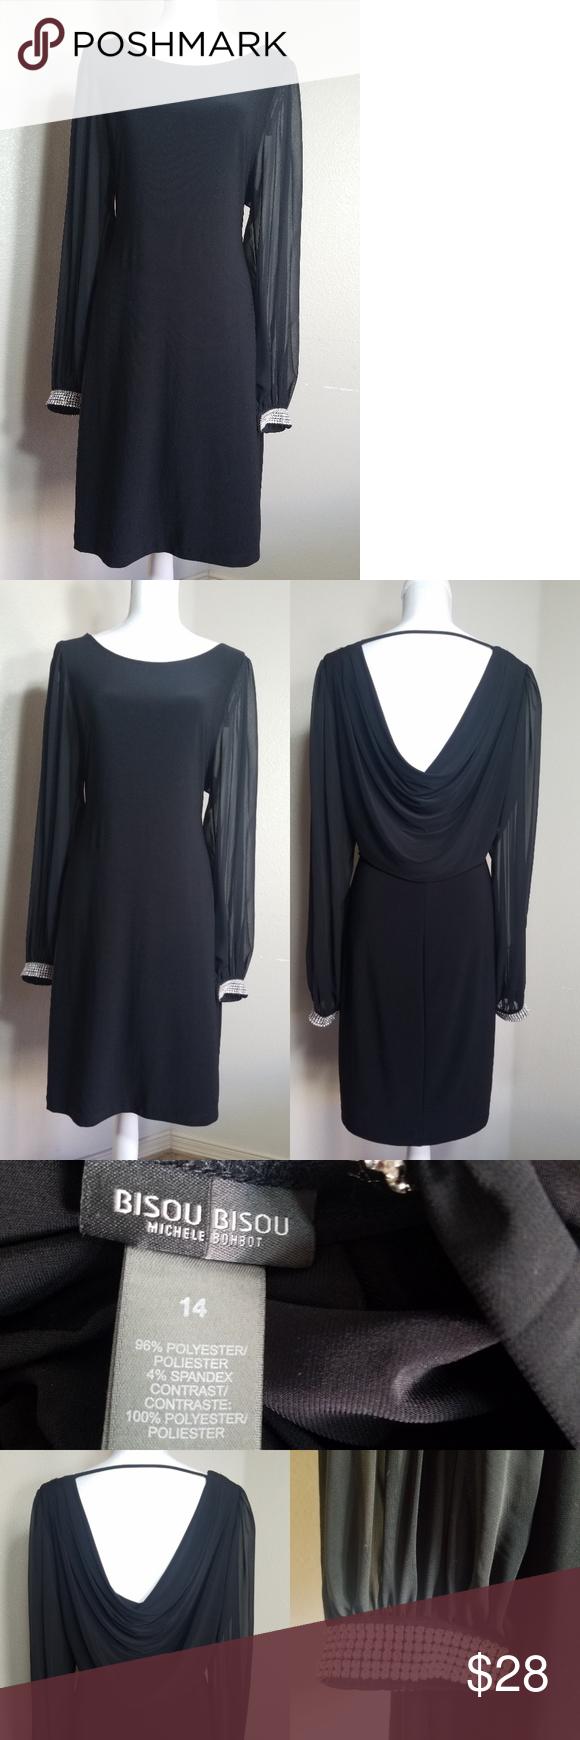 Bisou bisou little black dress sheer long sleeves my posh picks